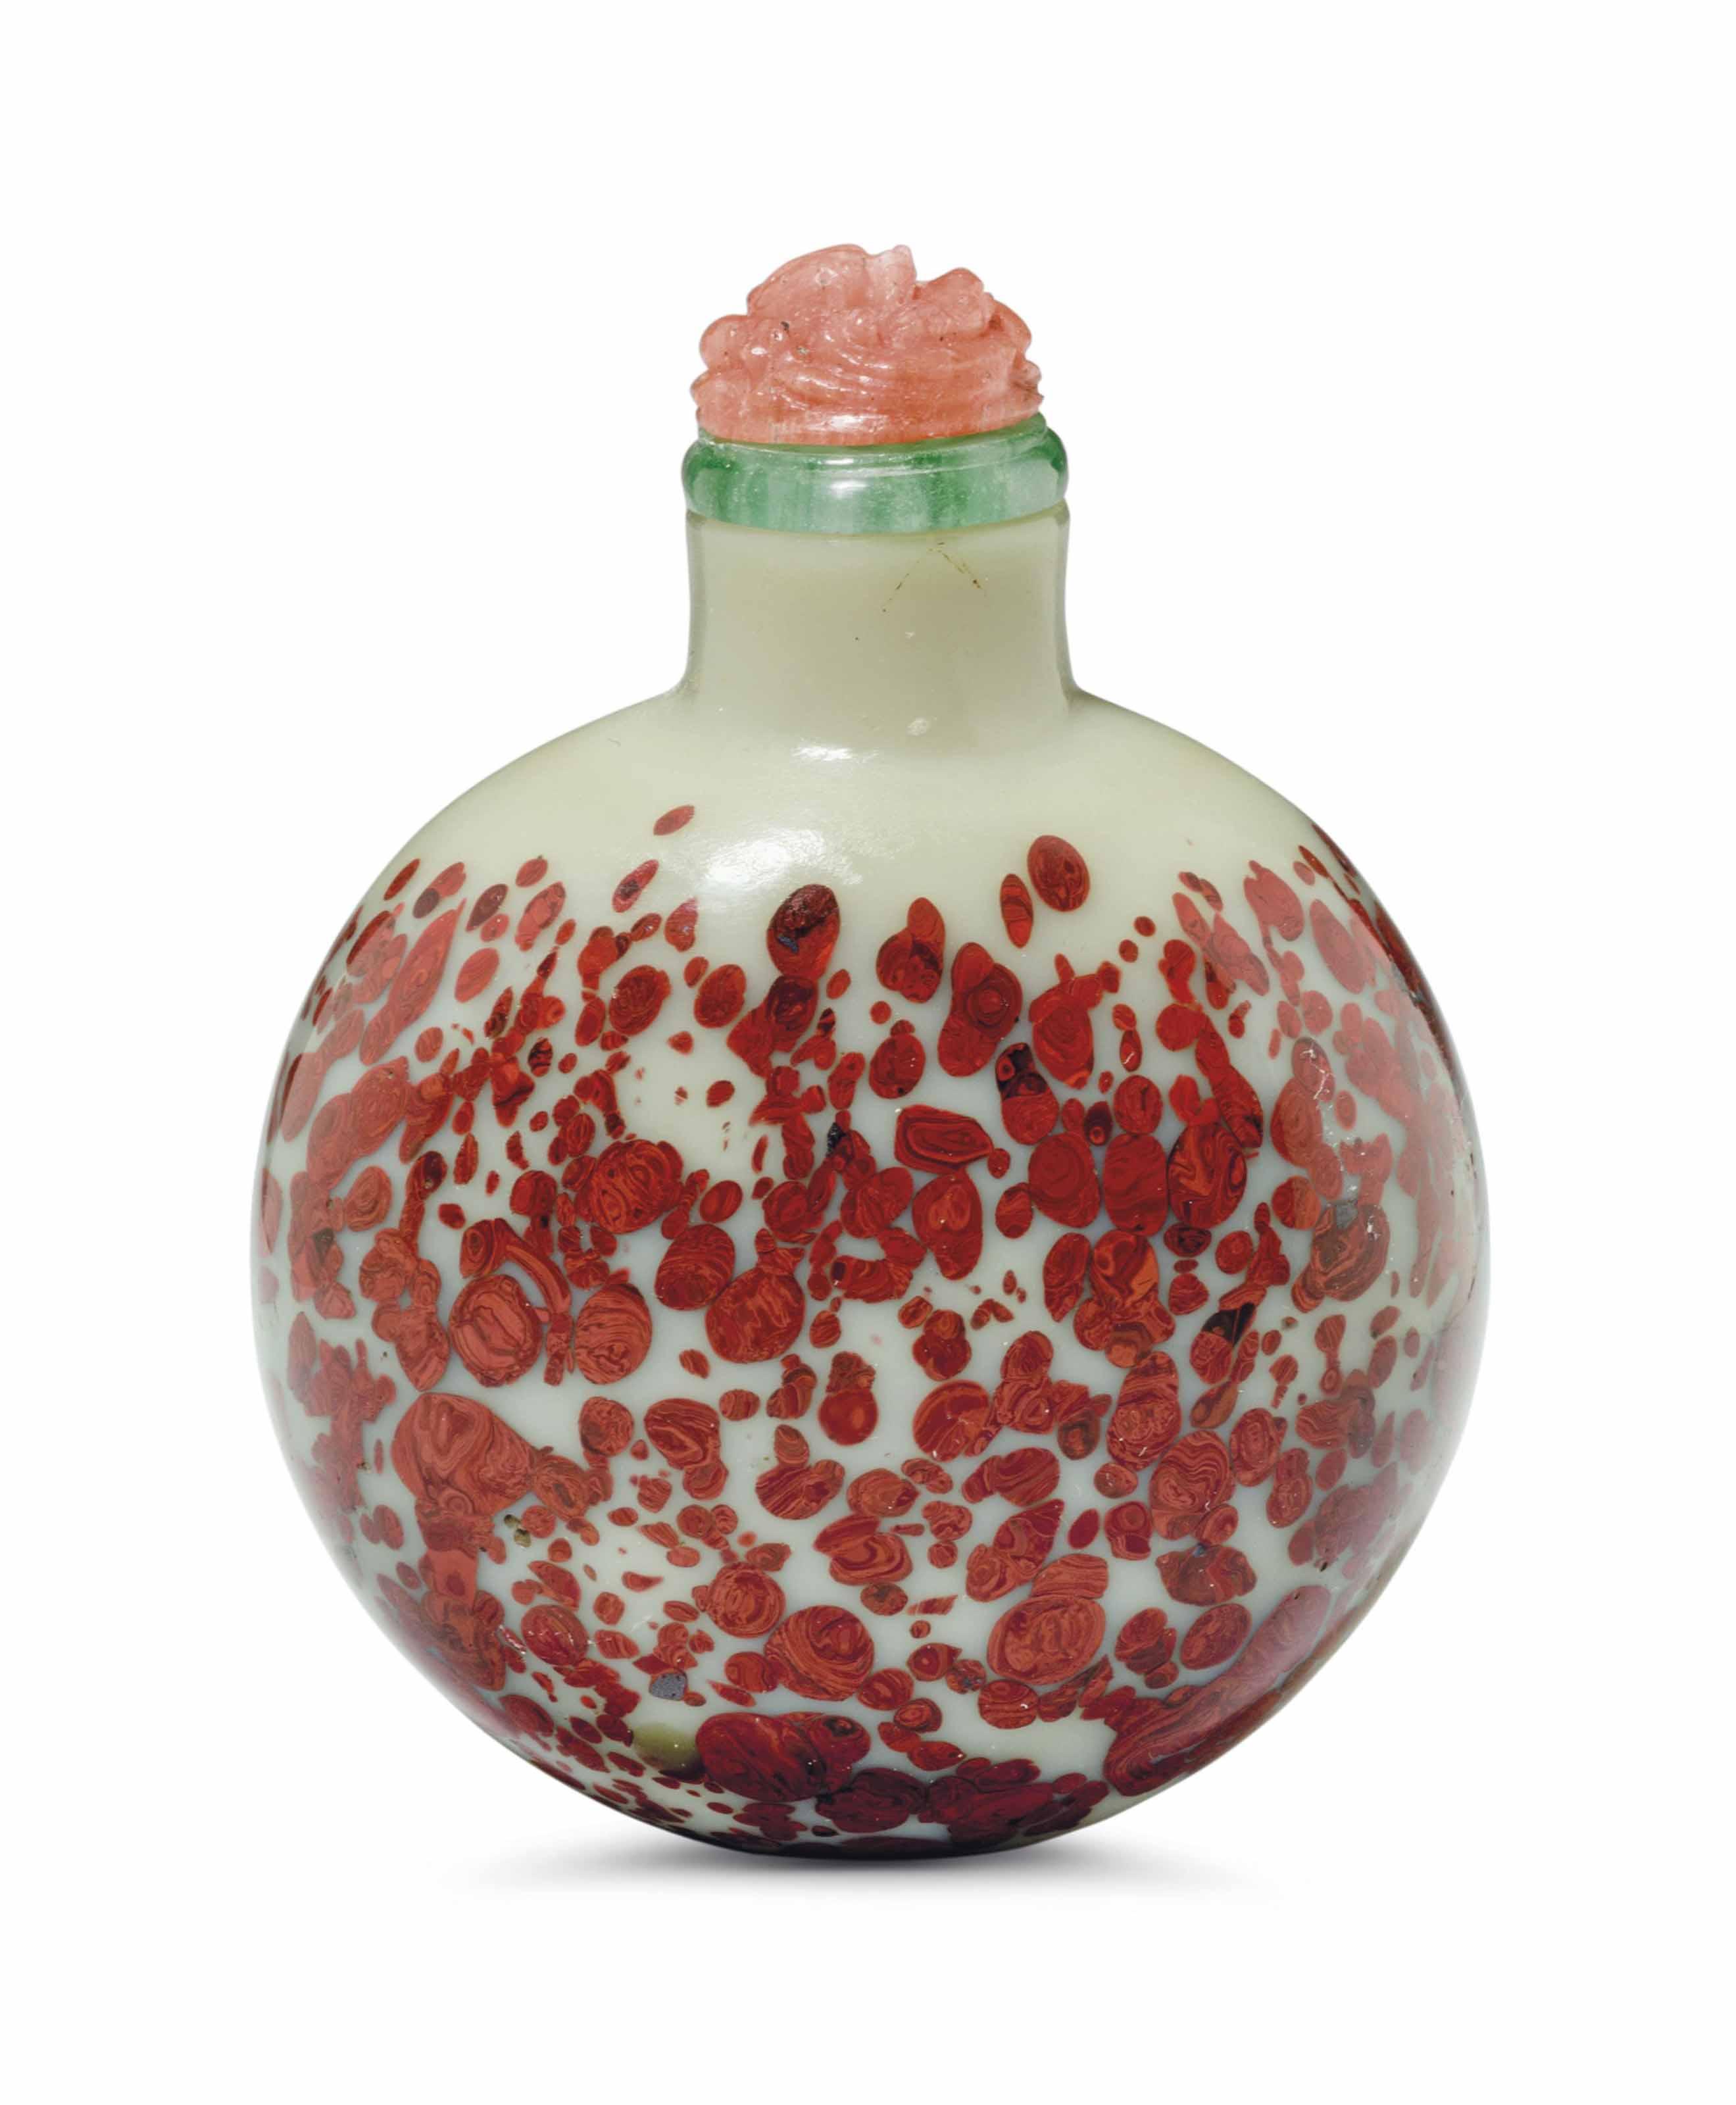 A RED-SPLASHED BEIGE GLASS SNU